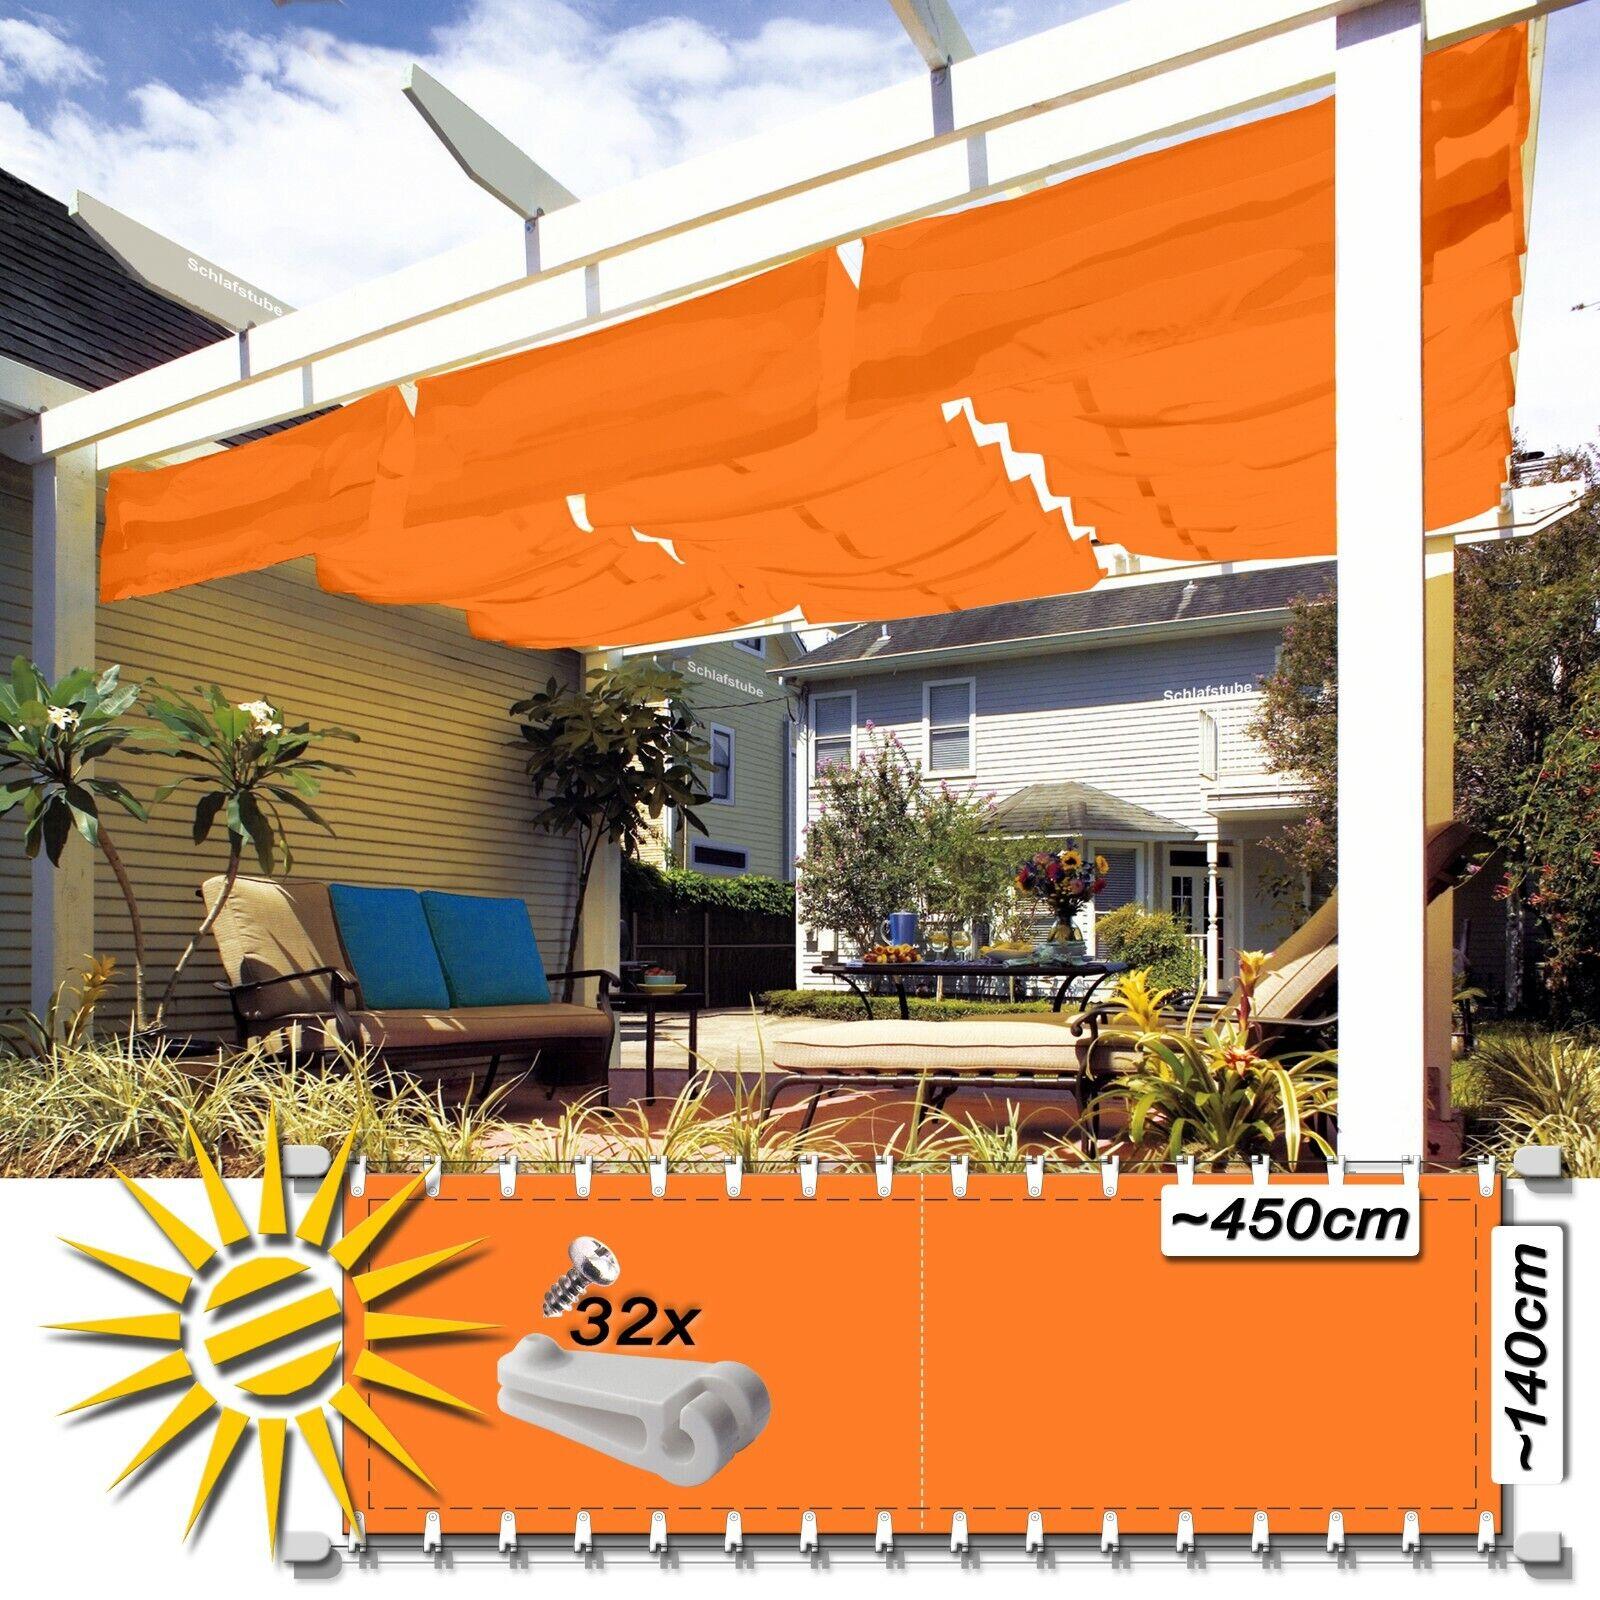 Seilspannmarkise Orange ca 450x140 cm Pergola Komplett Set + 32 Laufhaken 8 Ösen